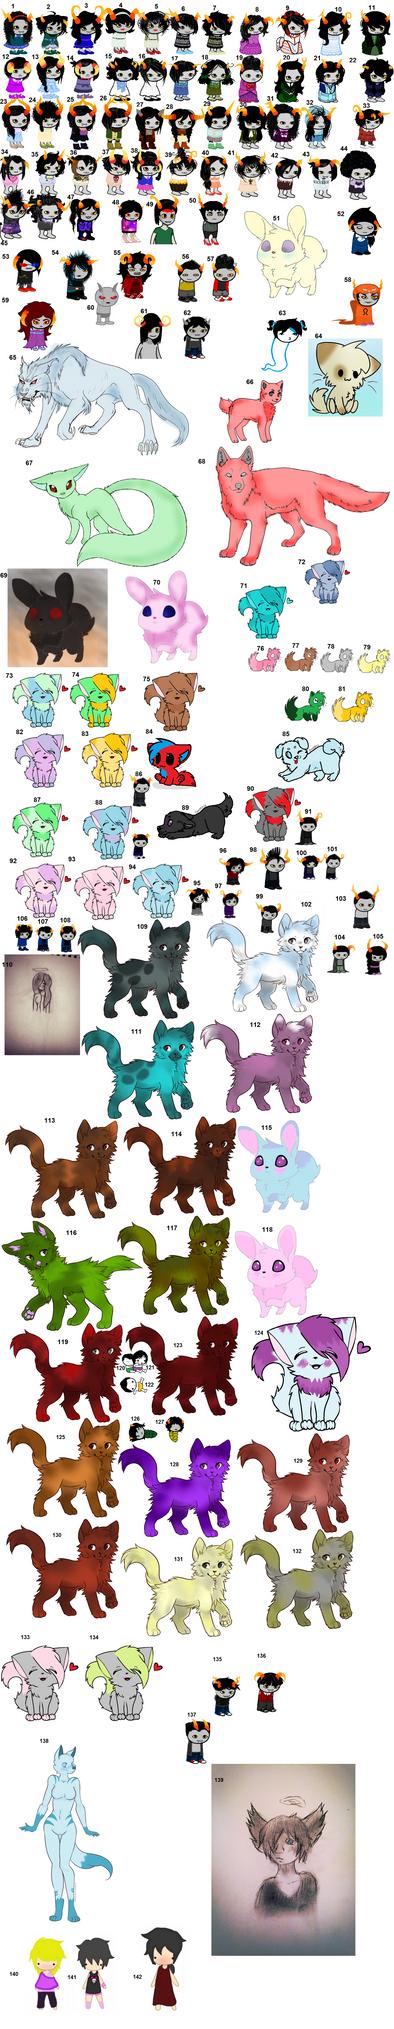 Art For Adopts 3 (Open) by KakeandOreosAdopts